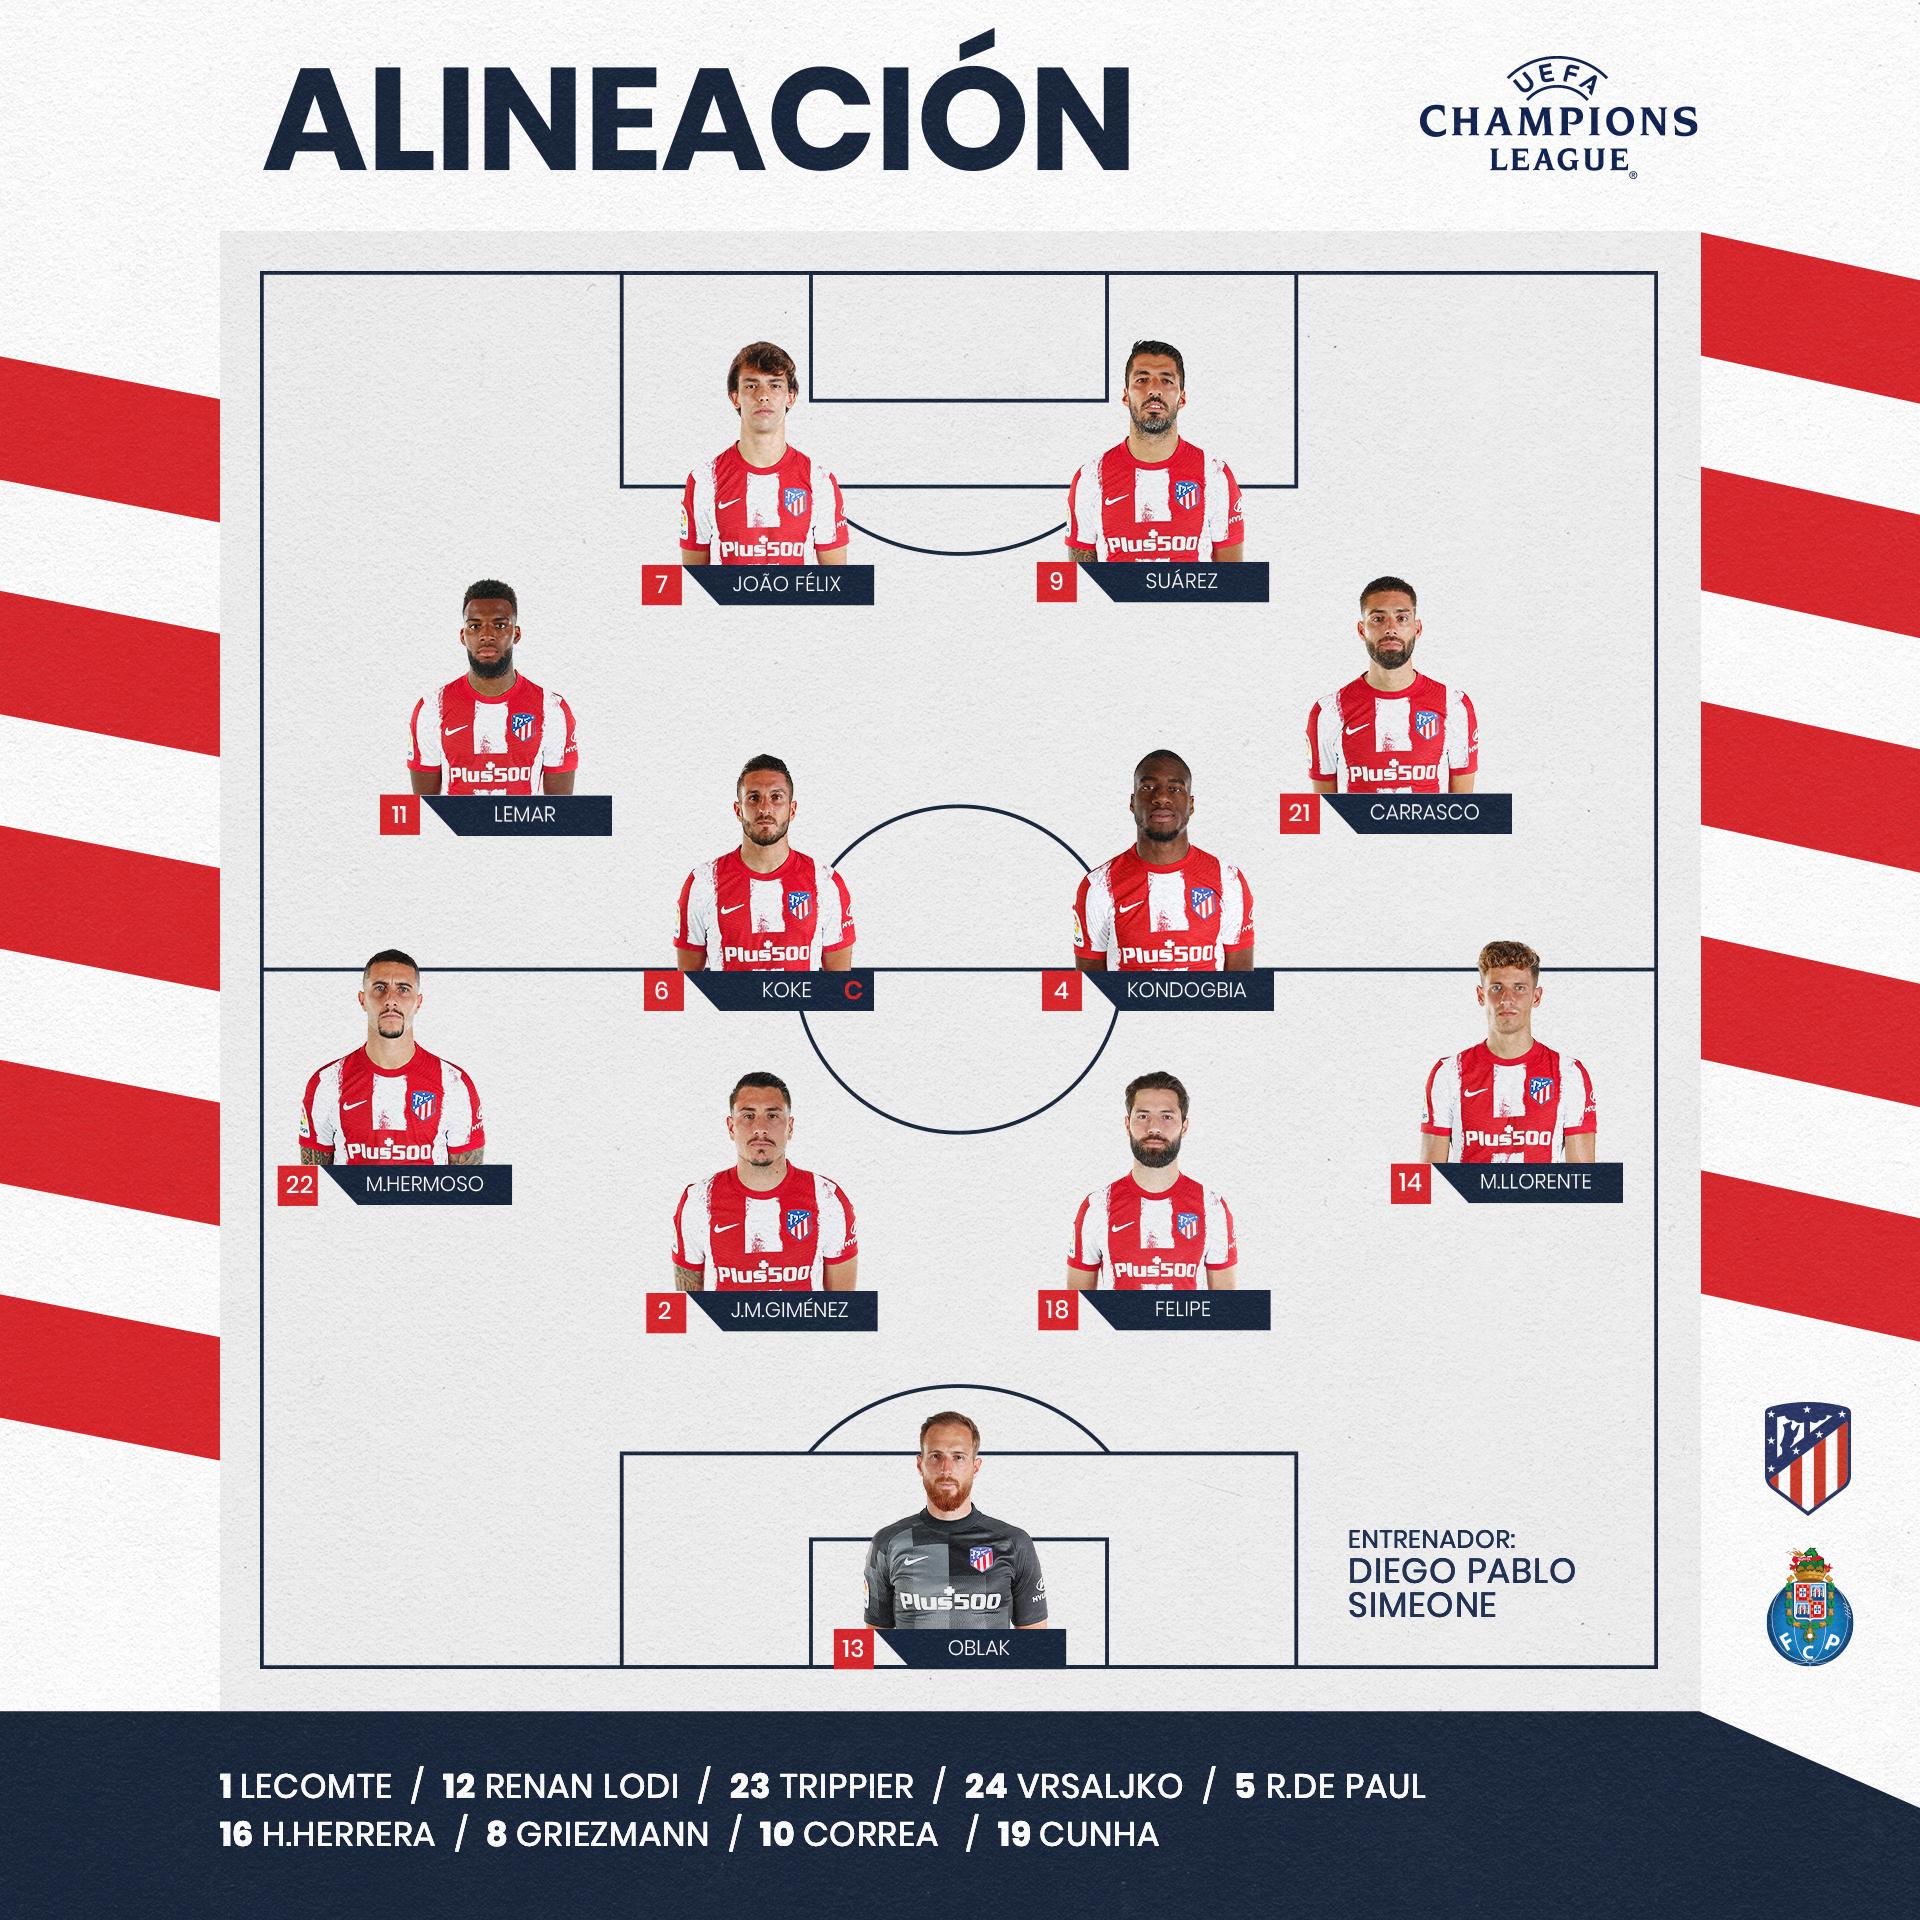 Atletico Madrid formation